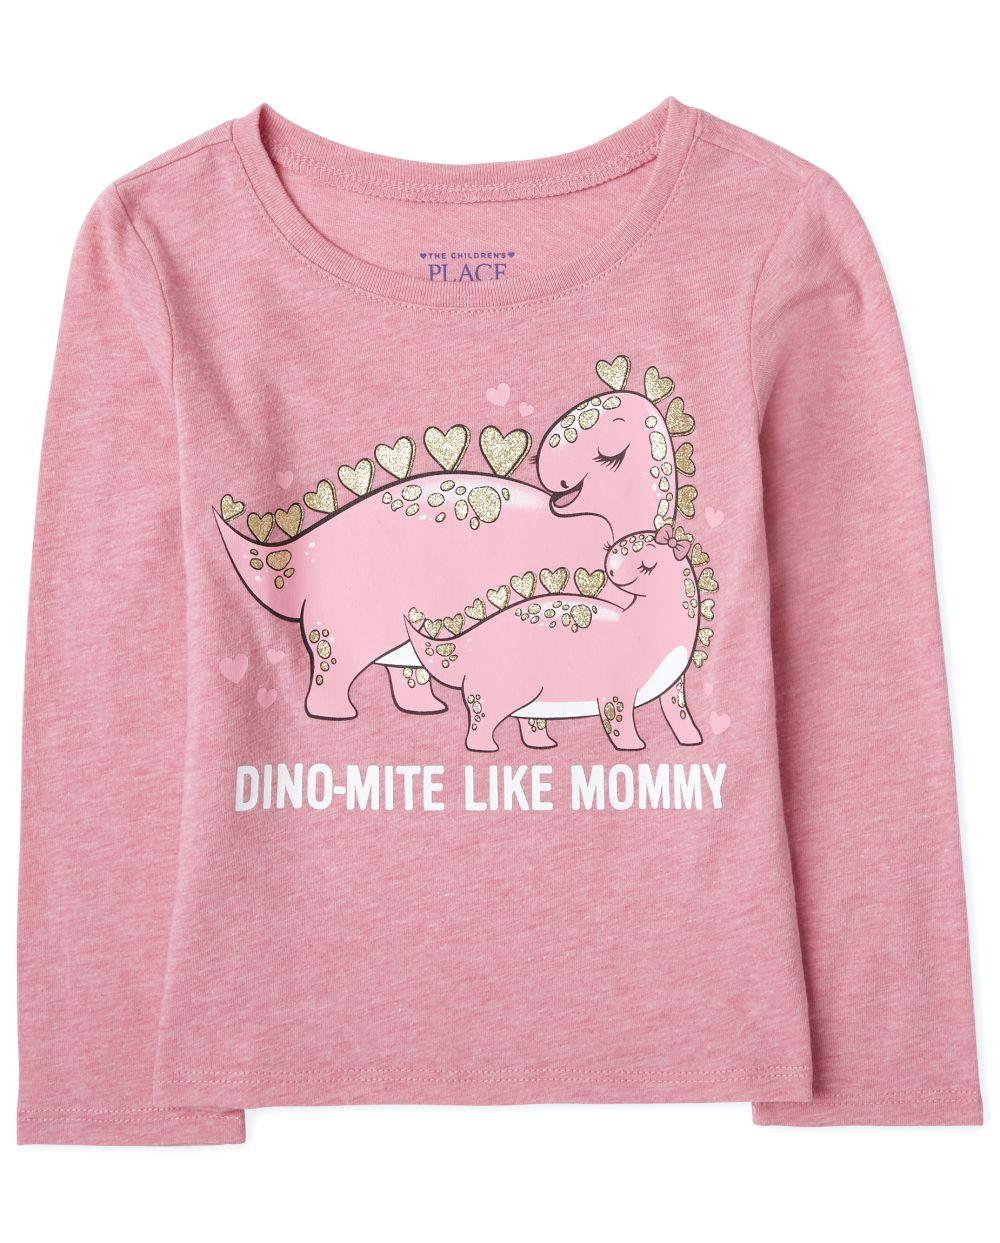 Baby And Toddler Girls Dino Mite Graphic Tee